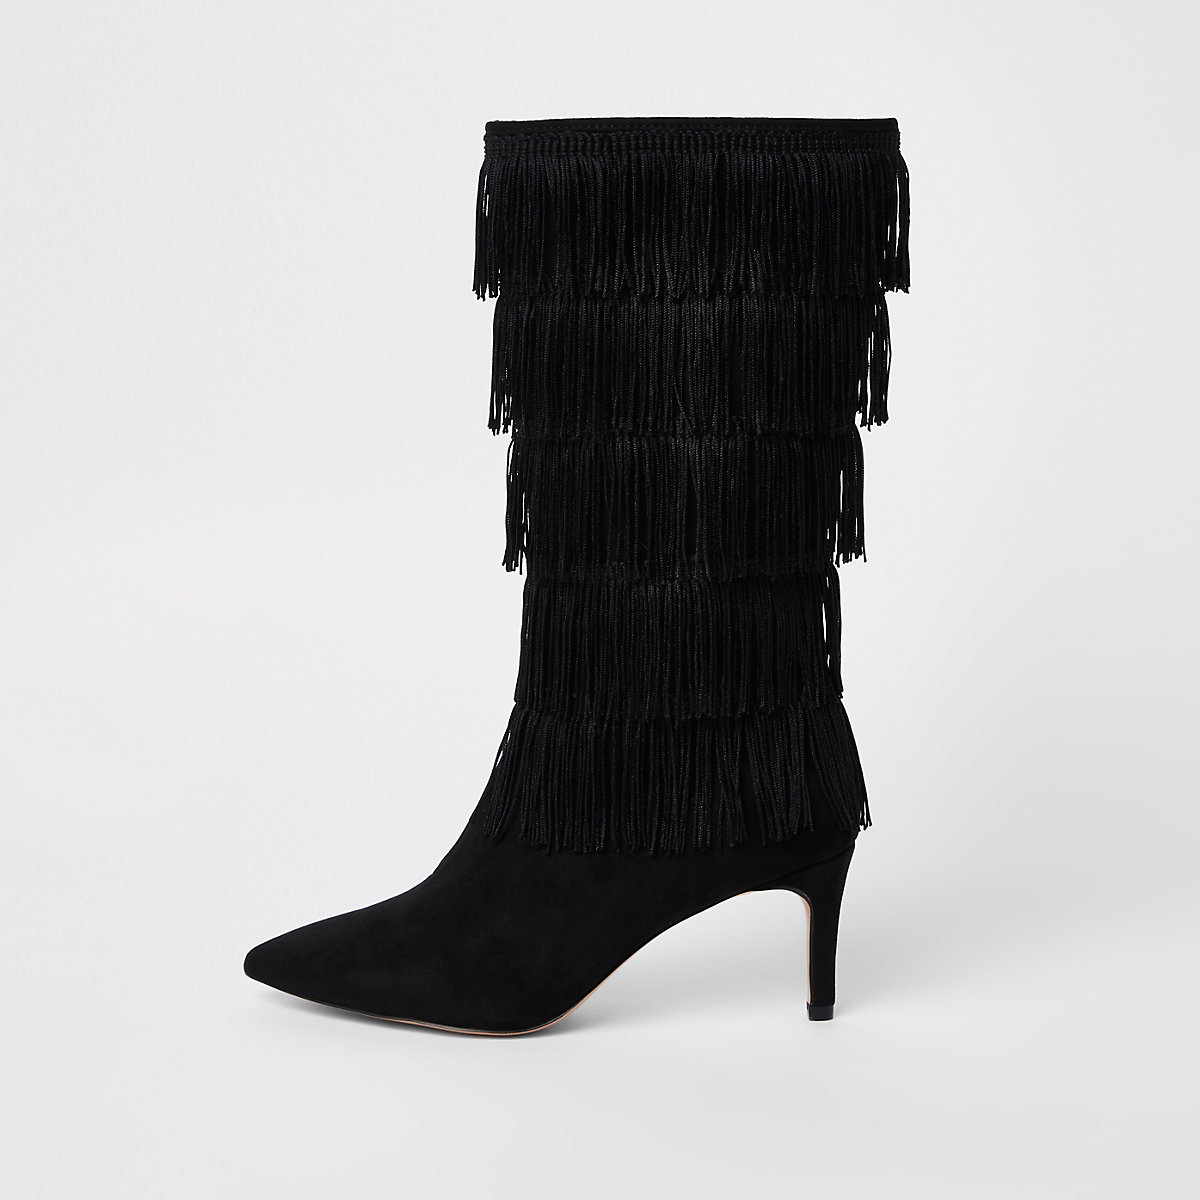 Black tassel high leg boots